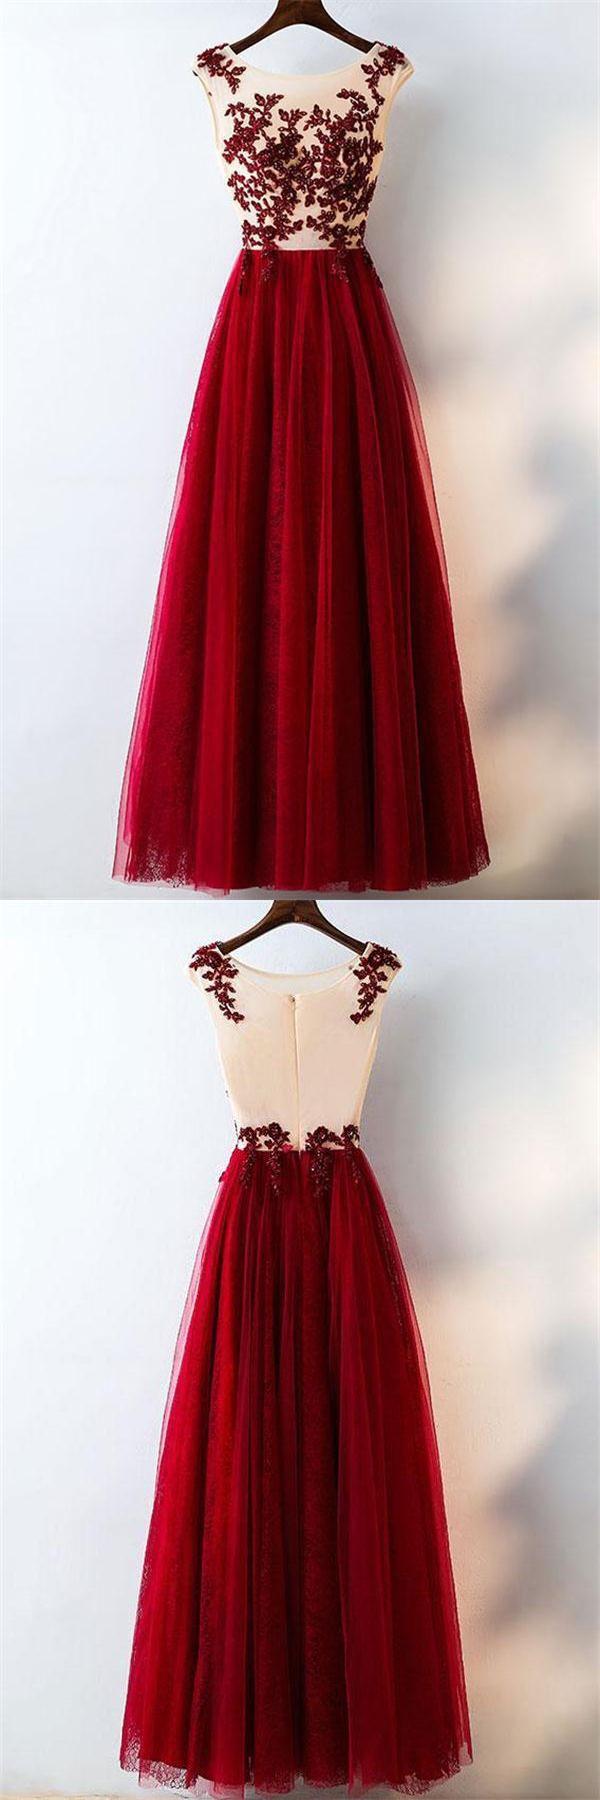 Sparkly modest long aline lace tulle burgundy long elegant prom